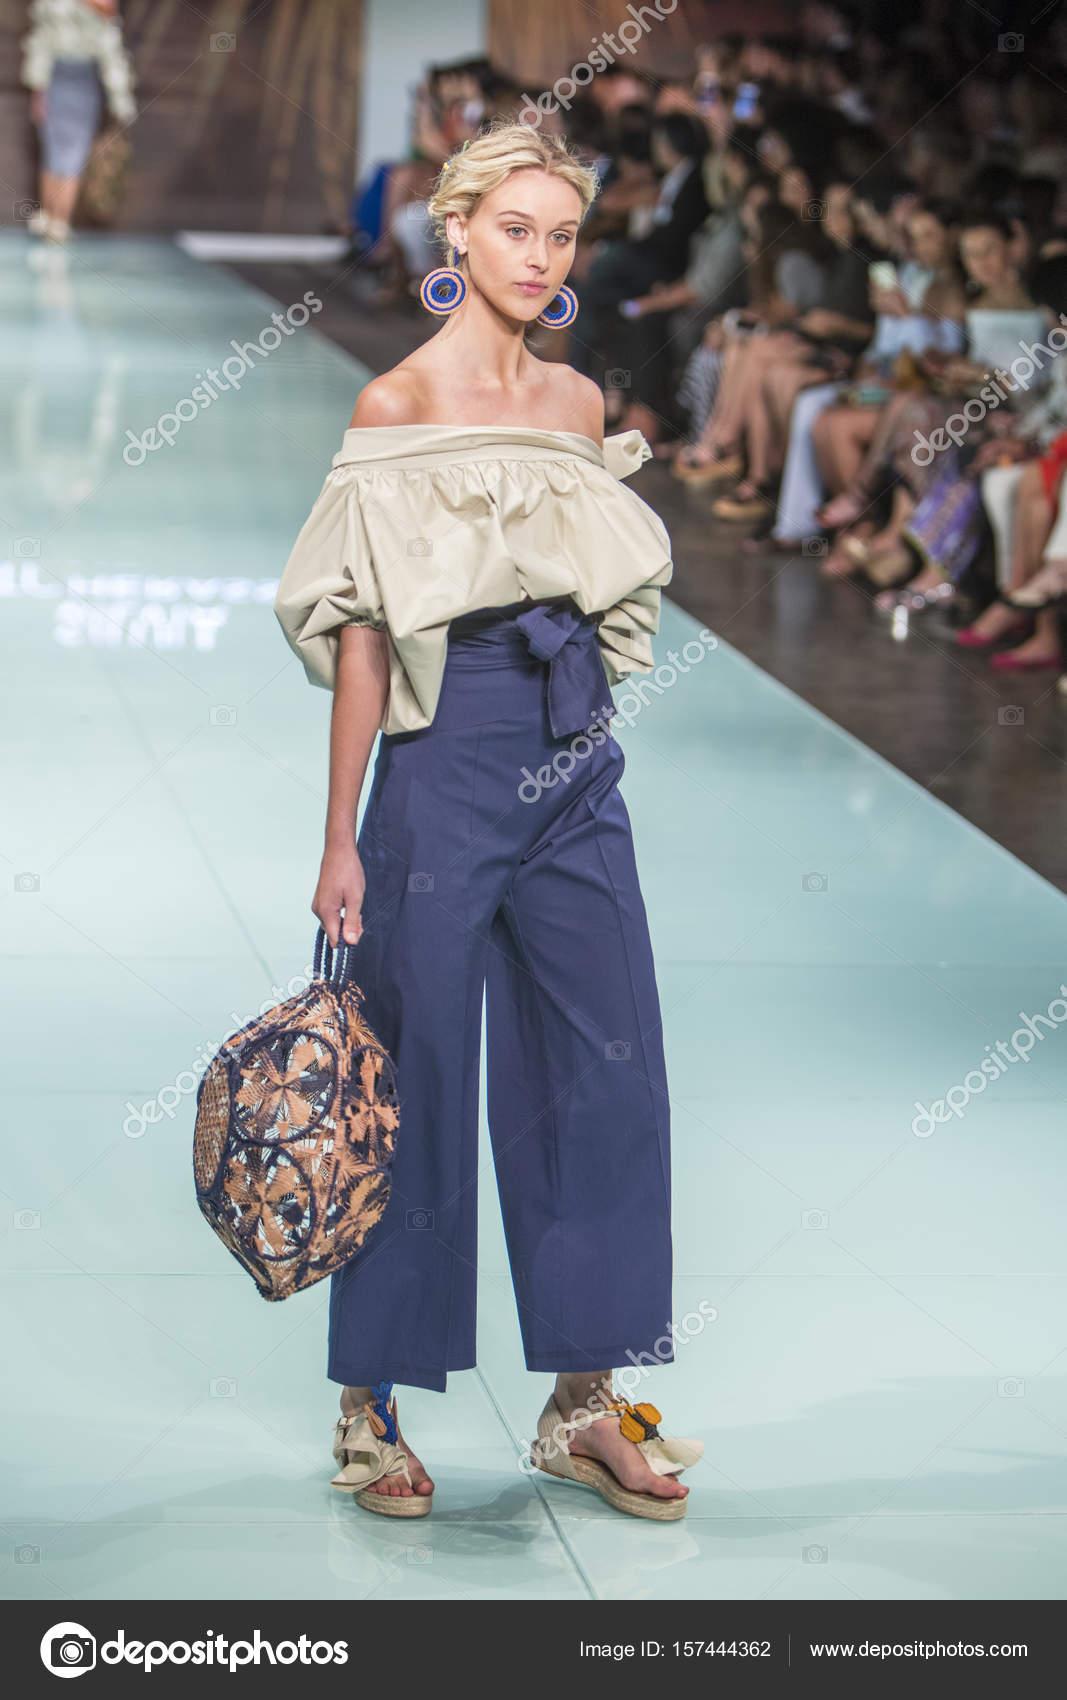 Silvia Tcherassi Fashion Show Resort 2017 – Stock Editorial Photo ...